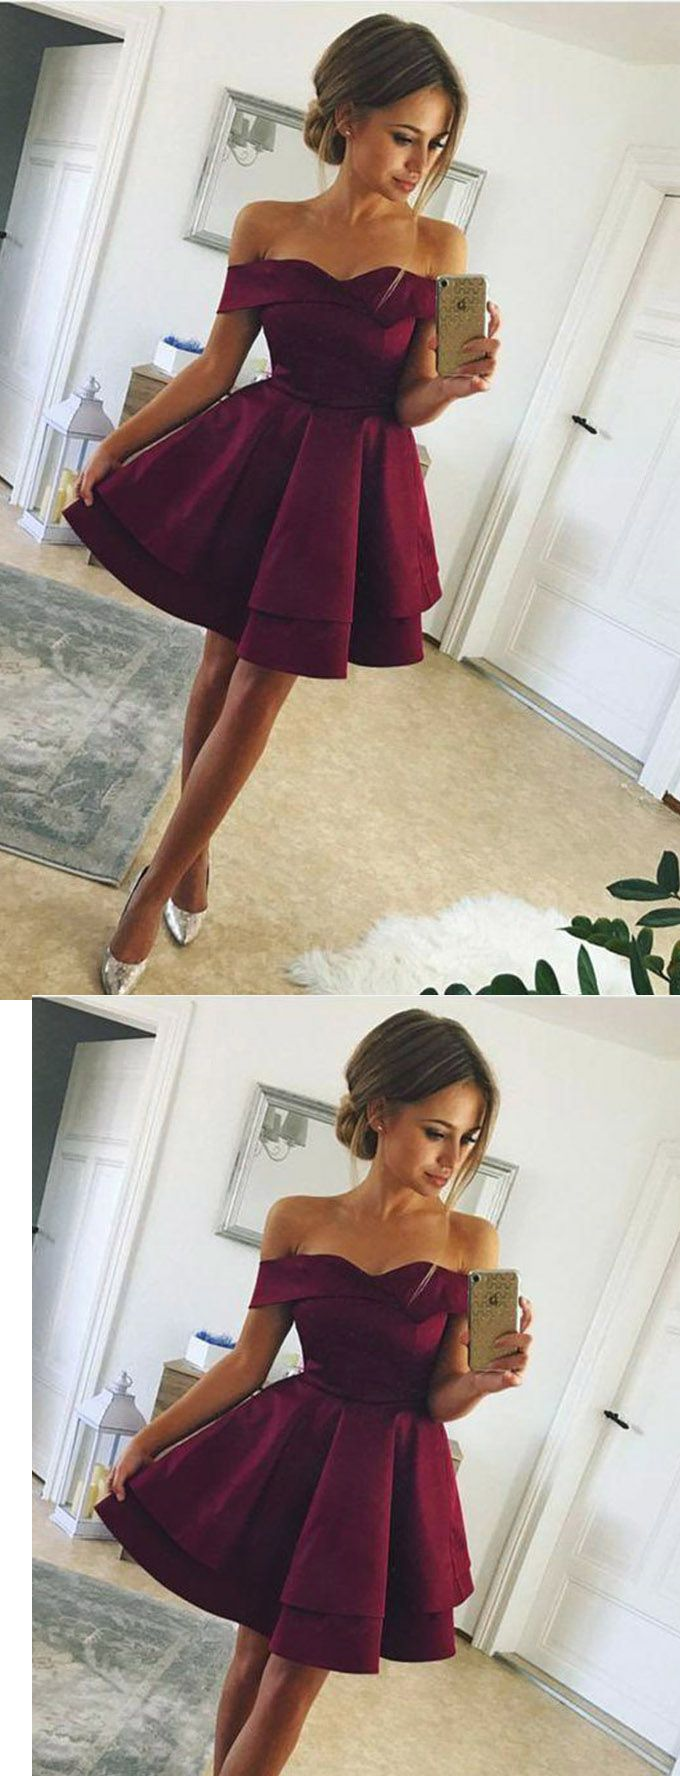 Classy th grade junior prom dress short sp in dresses